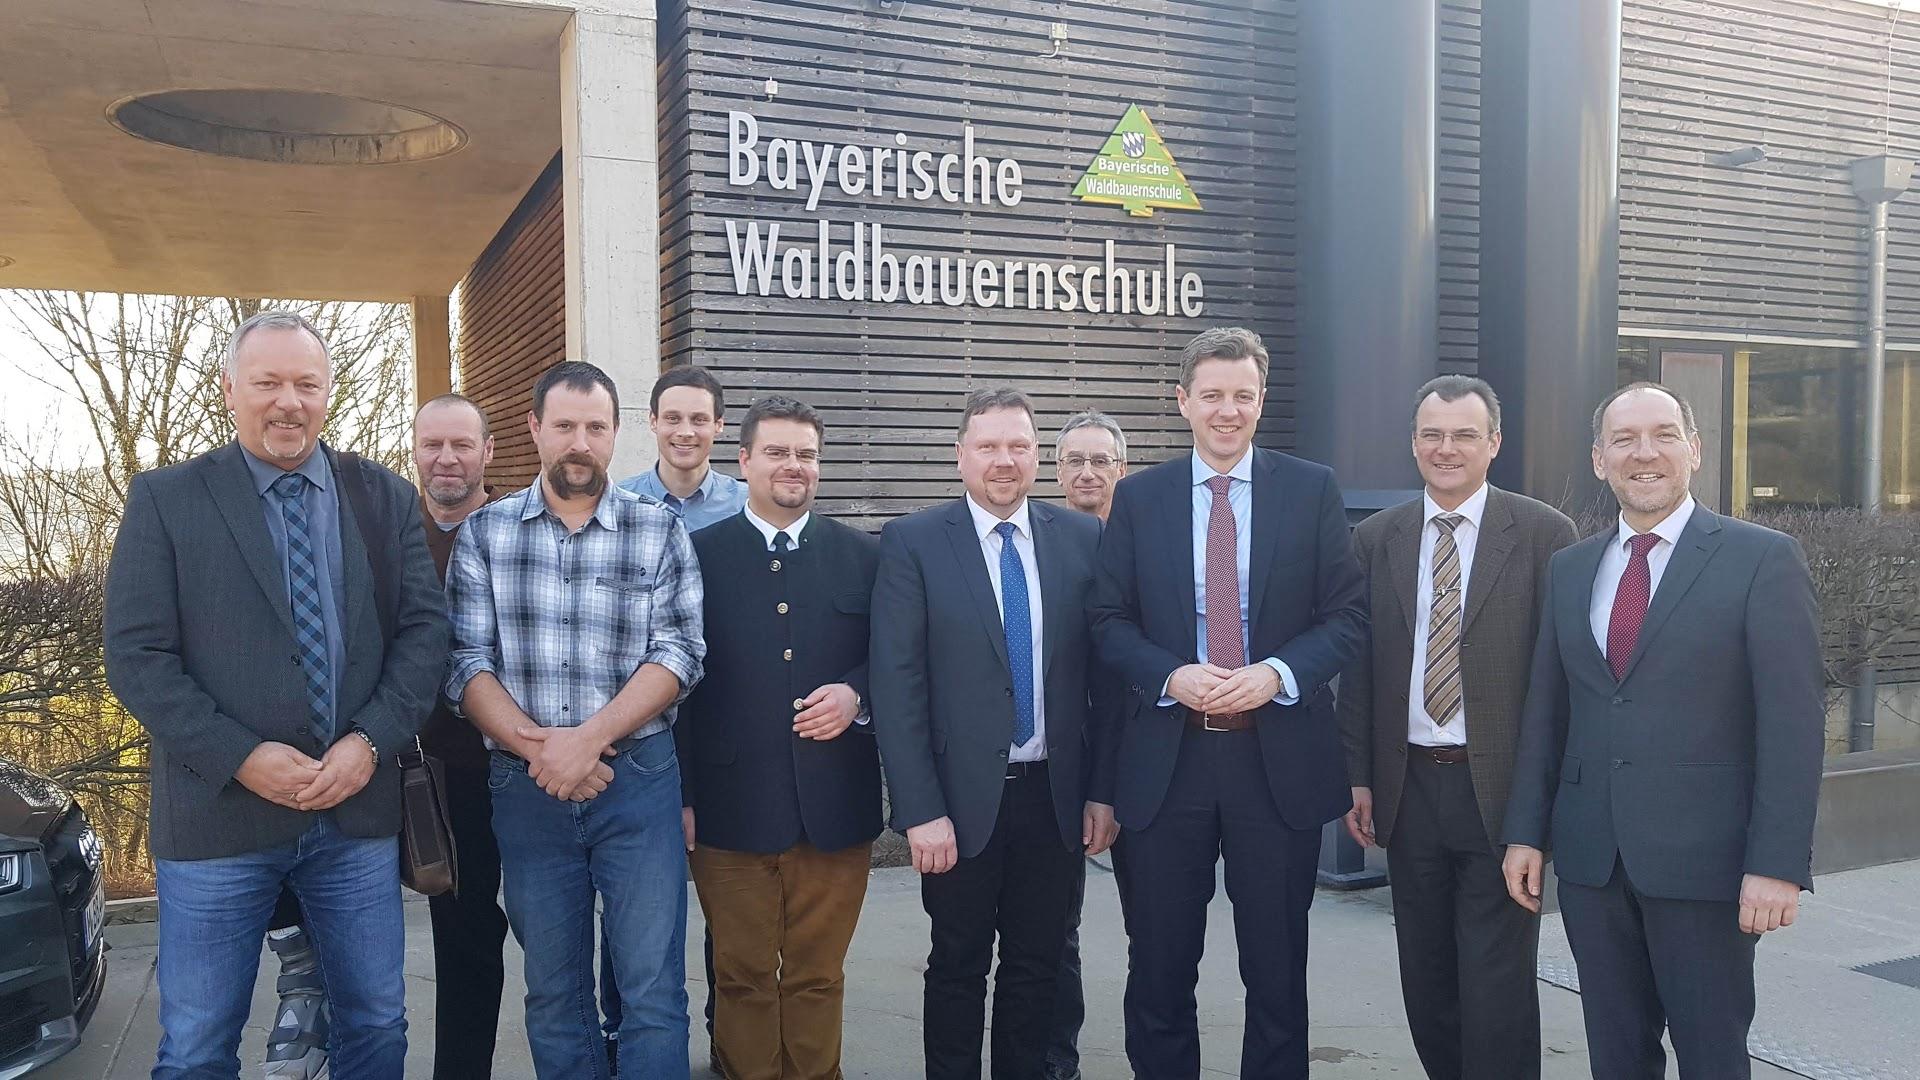 Gruppenbild von links nach rechts: Werner Peetz (Stadt Schwarzenbach am Wald), Thomas Baumann (AELF Kulmbach), Ralf Kremer (Forstunternehmer), Christian Rank (Landratsamt Hof), Peter Hummel (Schulleiter WBS Kelheim), Reiner Feulner (Bürgermeister Schwarzenbach am Wald), Thomas Krämer (Forstamtsleiter AELF Münchberg), Dr. Oliver Bär (Landrat Landkreis Hof), Johann Koch (Geschäftsführer Trägerverein WBS), Urban Treutlein (Referatsleiter Staatsministerium StMELF)